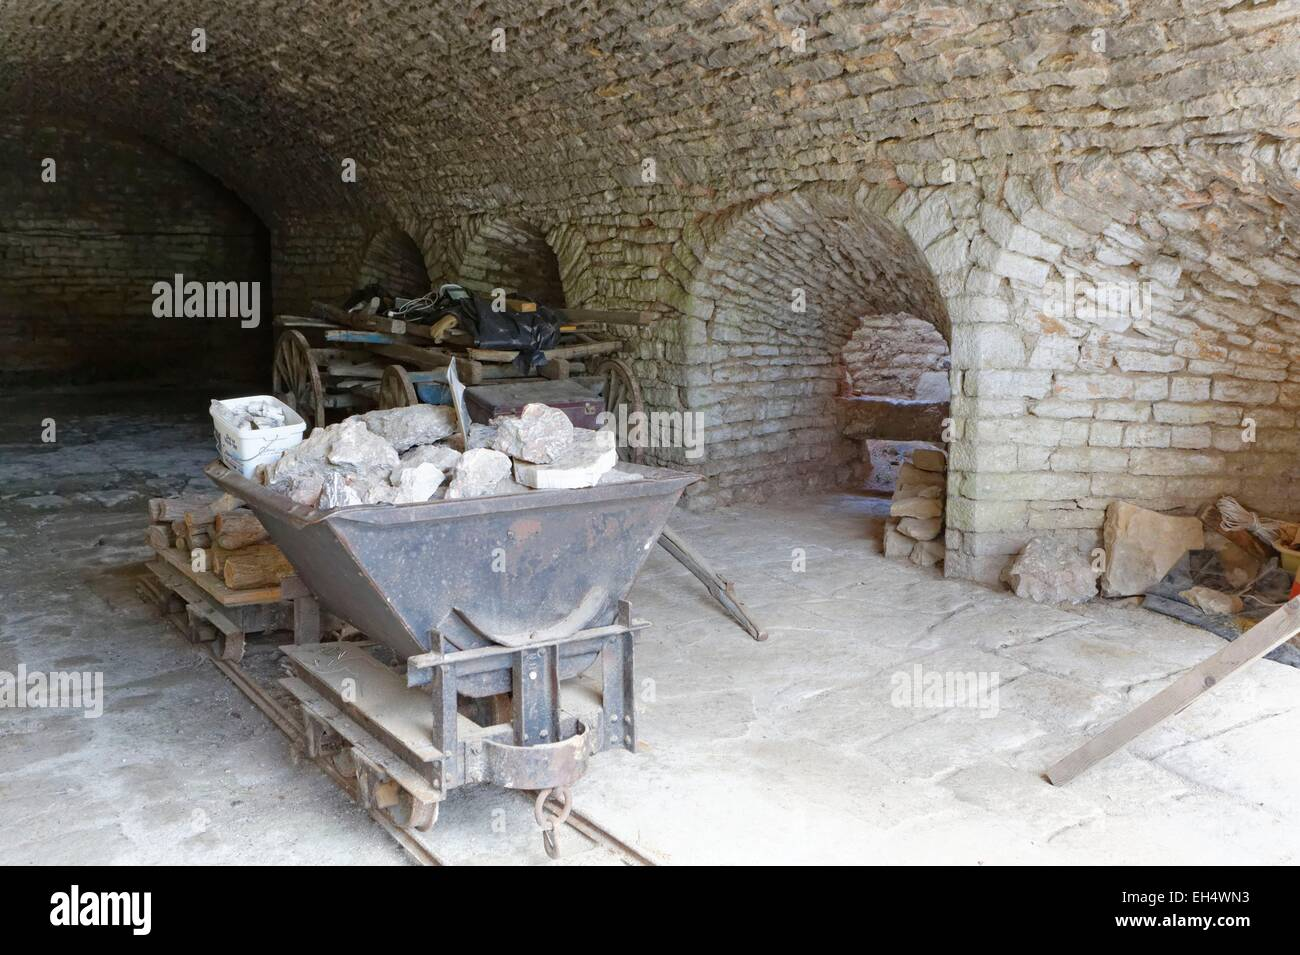 France, Saone et Loire, Berze la Ville, former oven - Stock Image